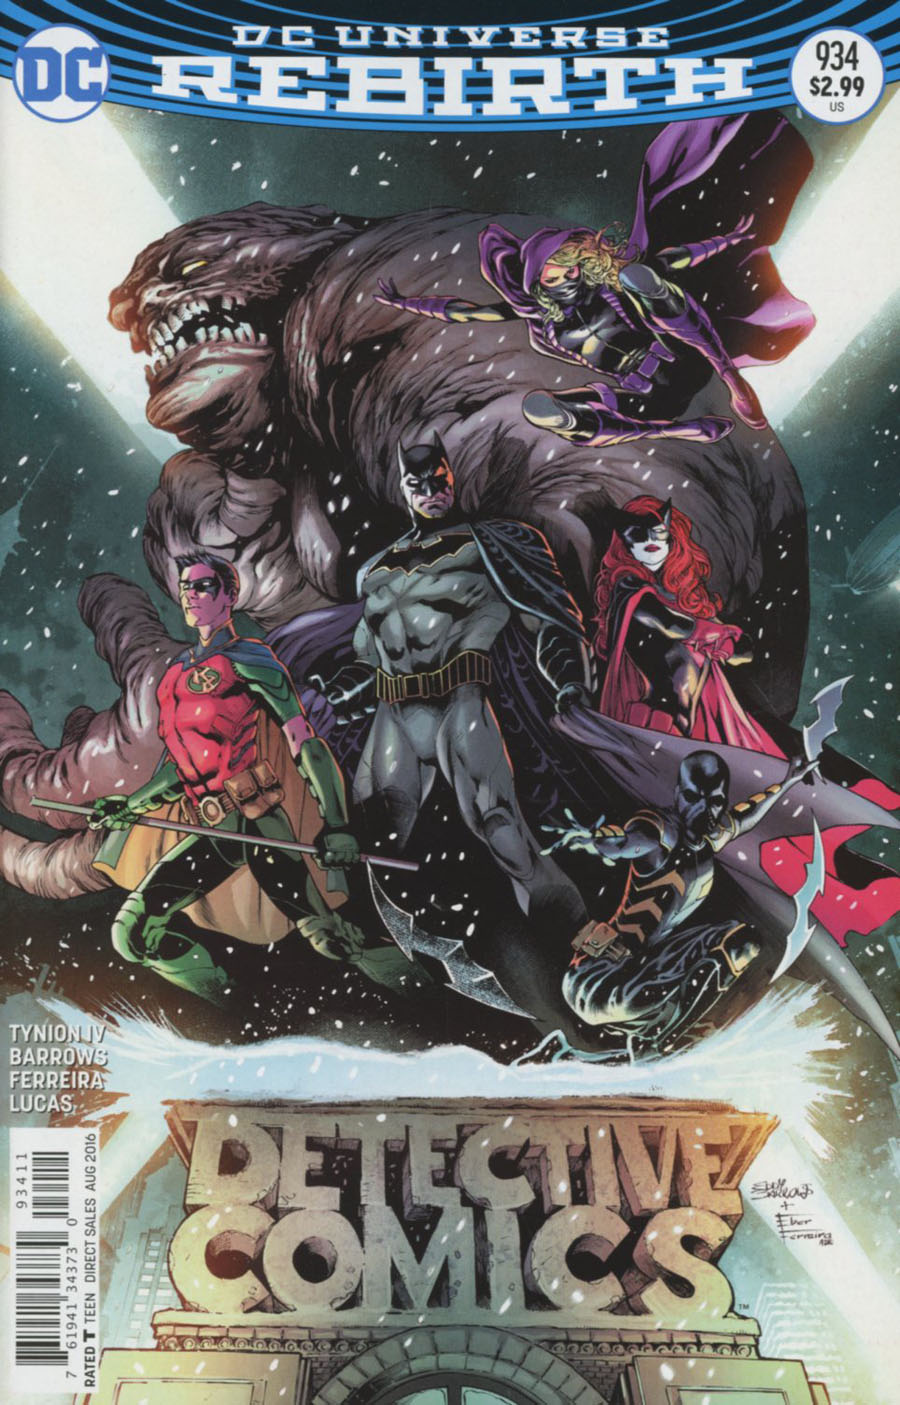 Detective Comics Vol 2 #934 Cover A 1st Ptg Regular Eddy Barrows & Eber Ferreira Cover